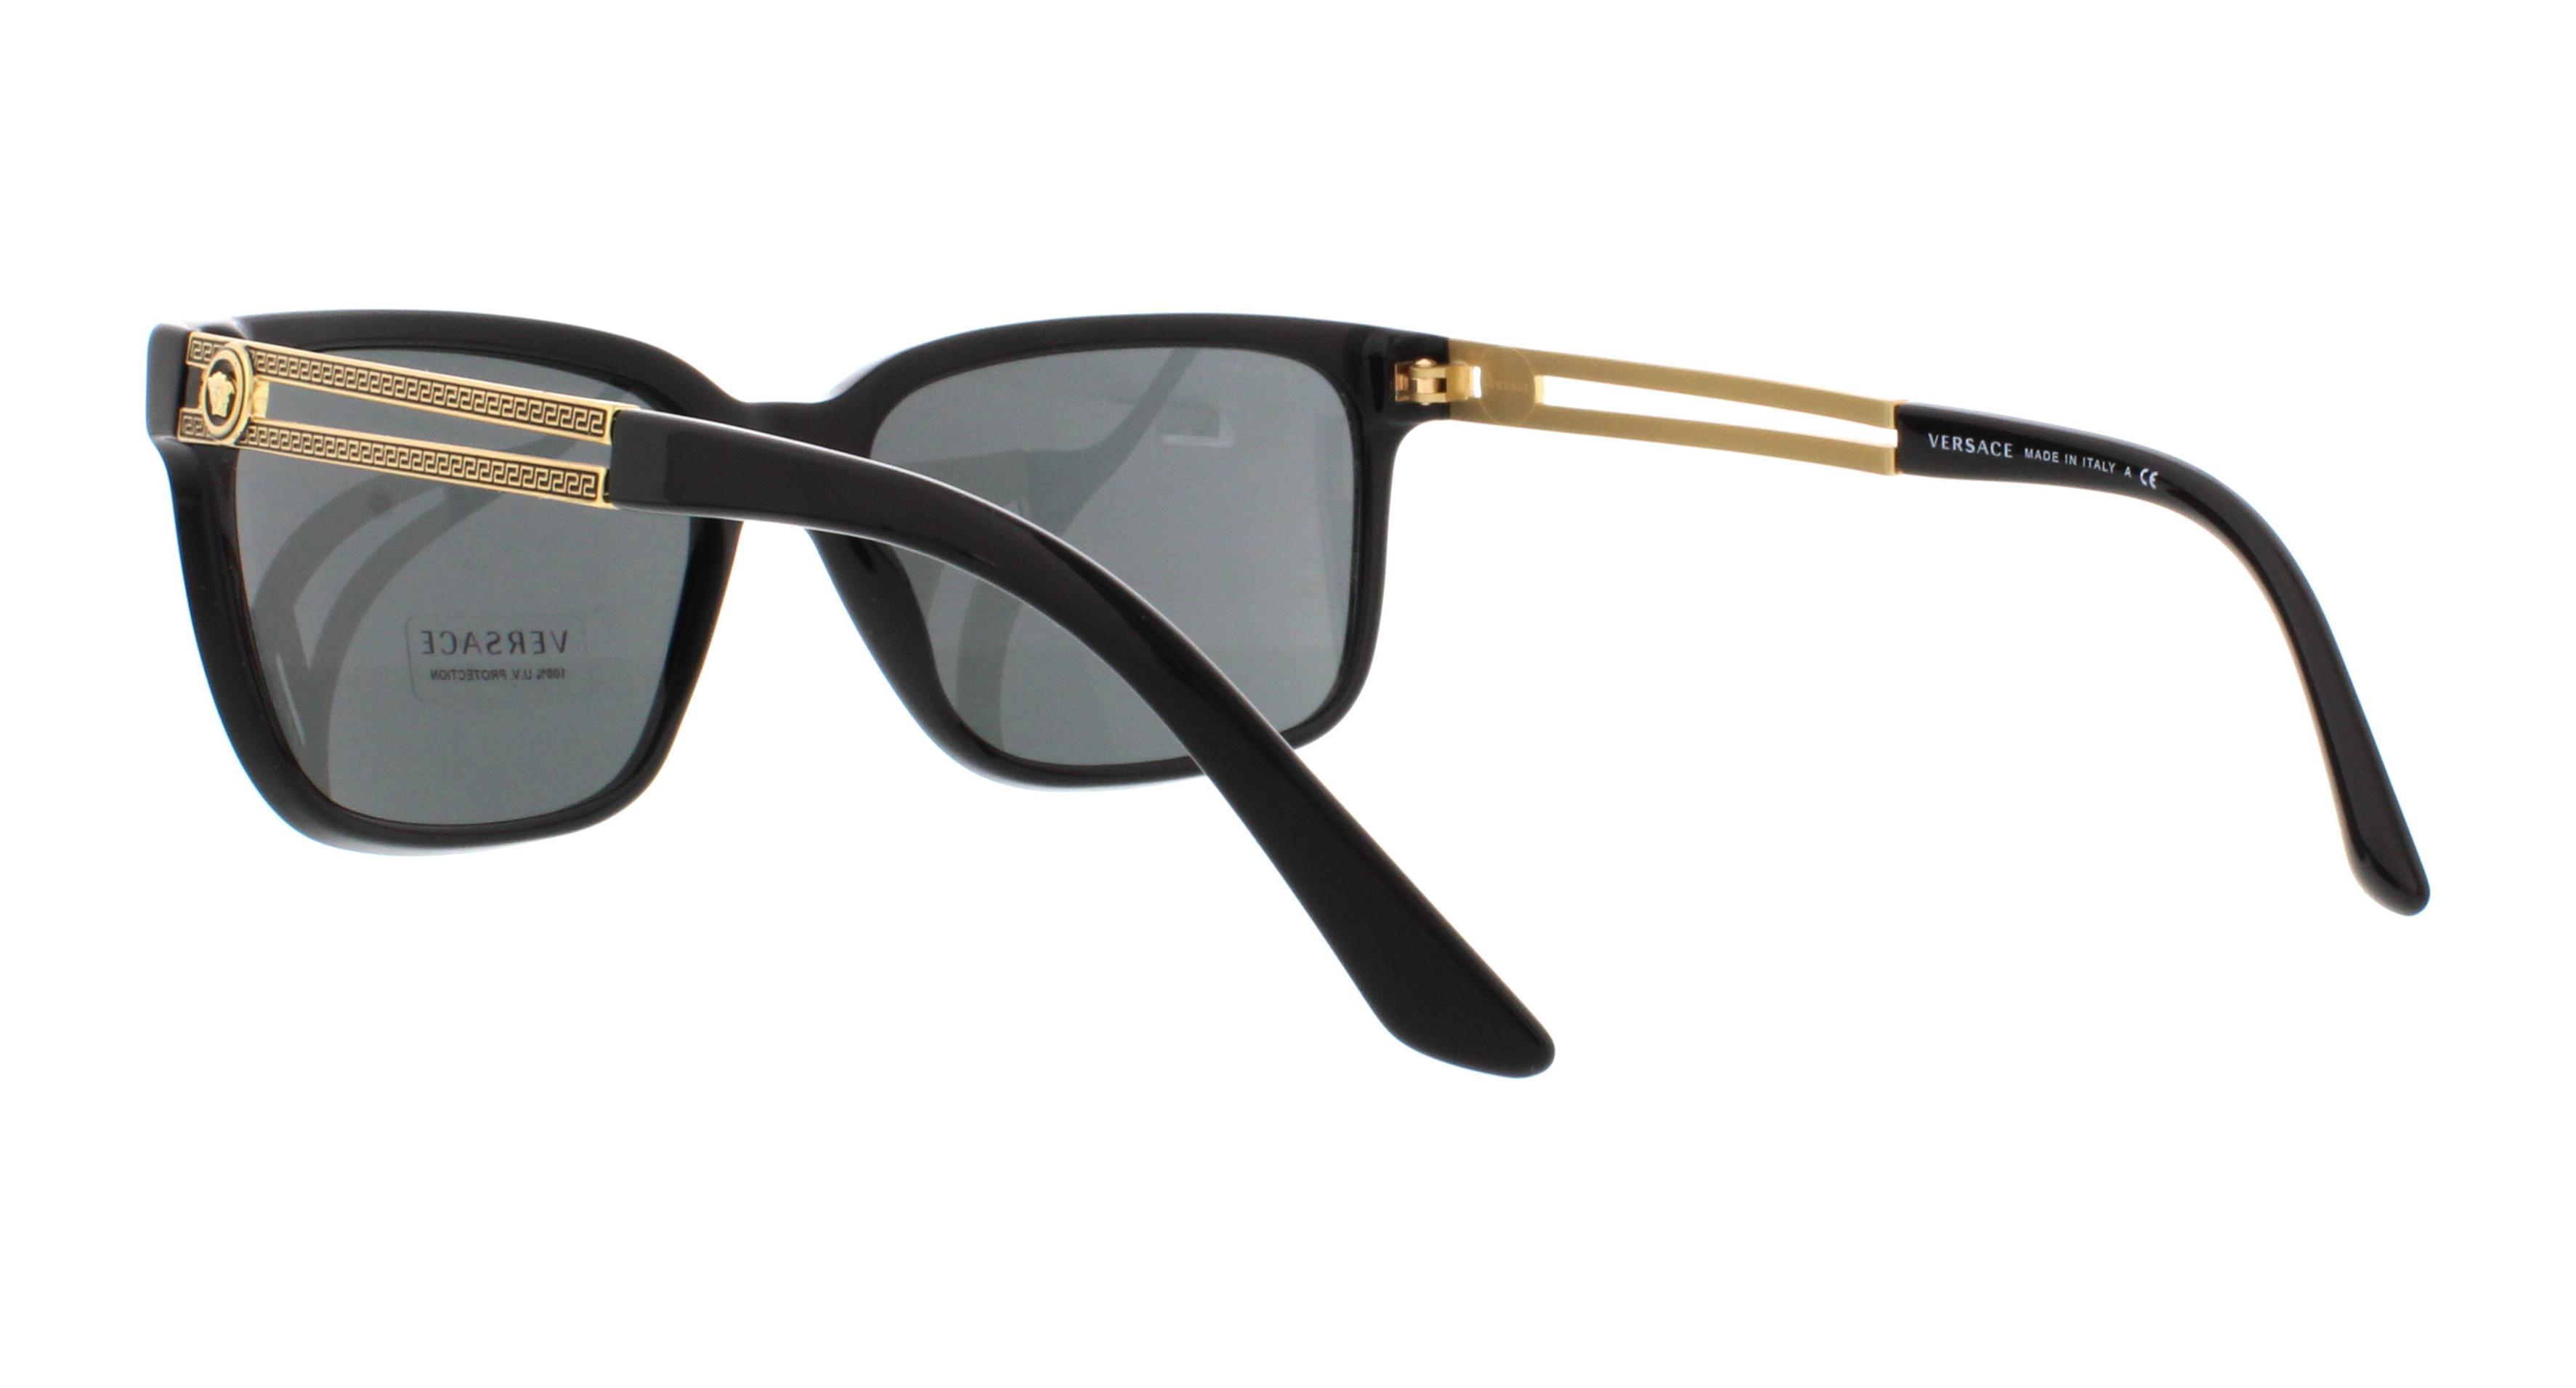 62a9379dff Designer frames outlet versace jpg 3546x1910 Versace mens sunglasses